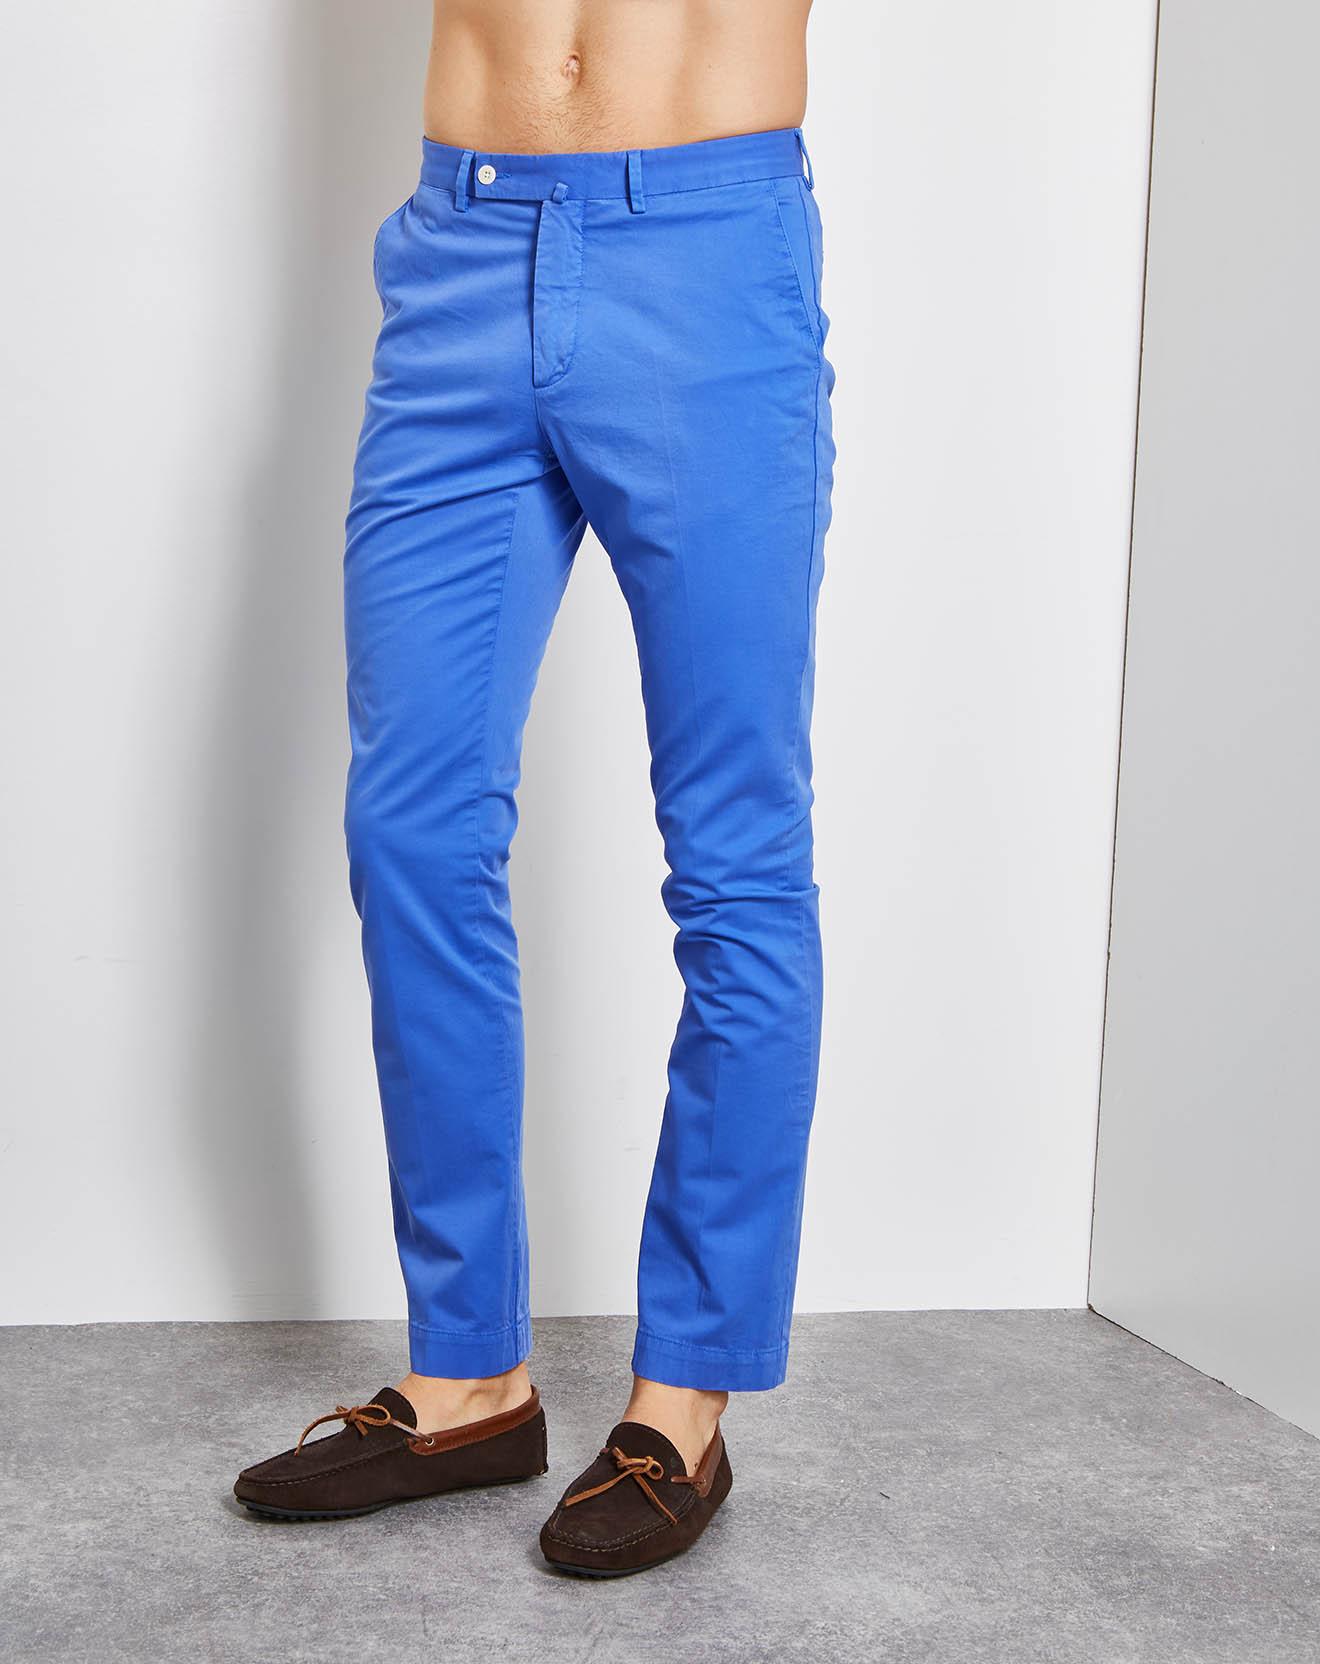 Pantalon Chino Slim Kensington bleu ciel - Hackett London - Modalova